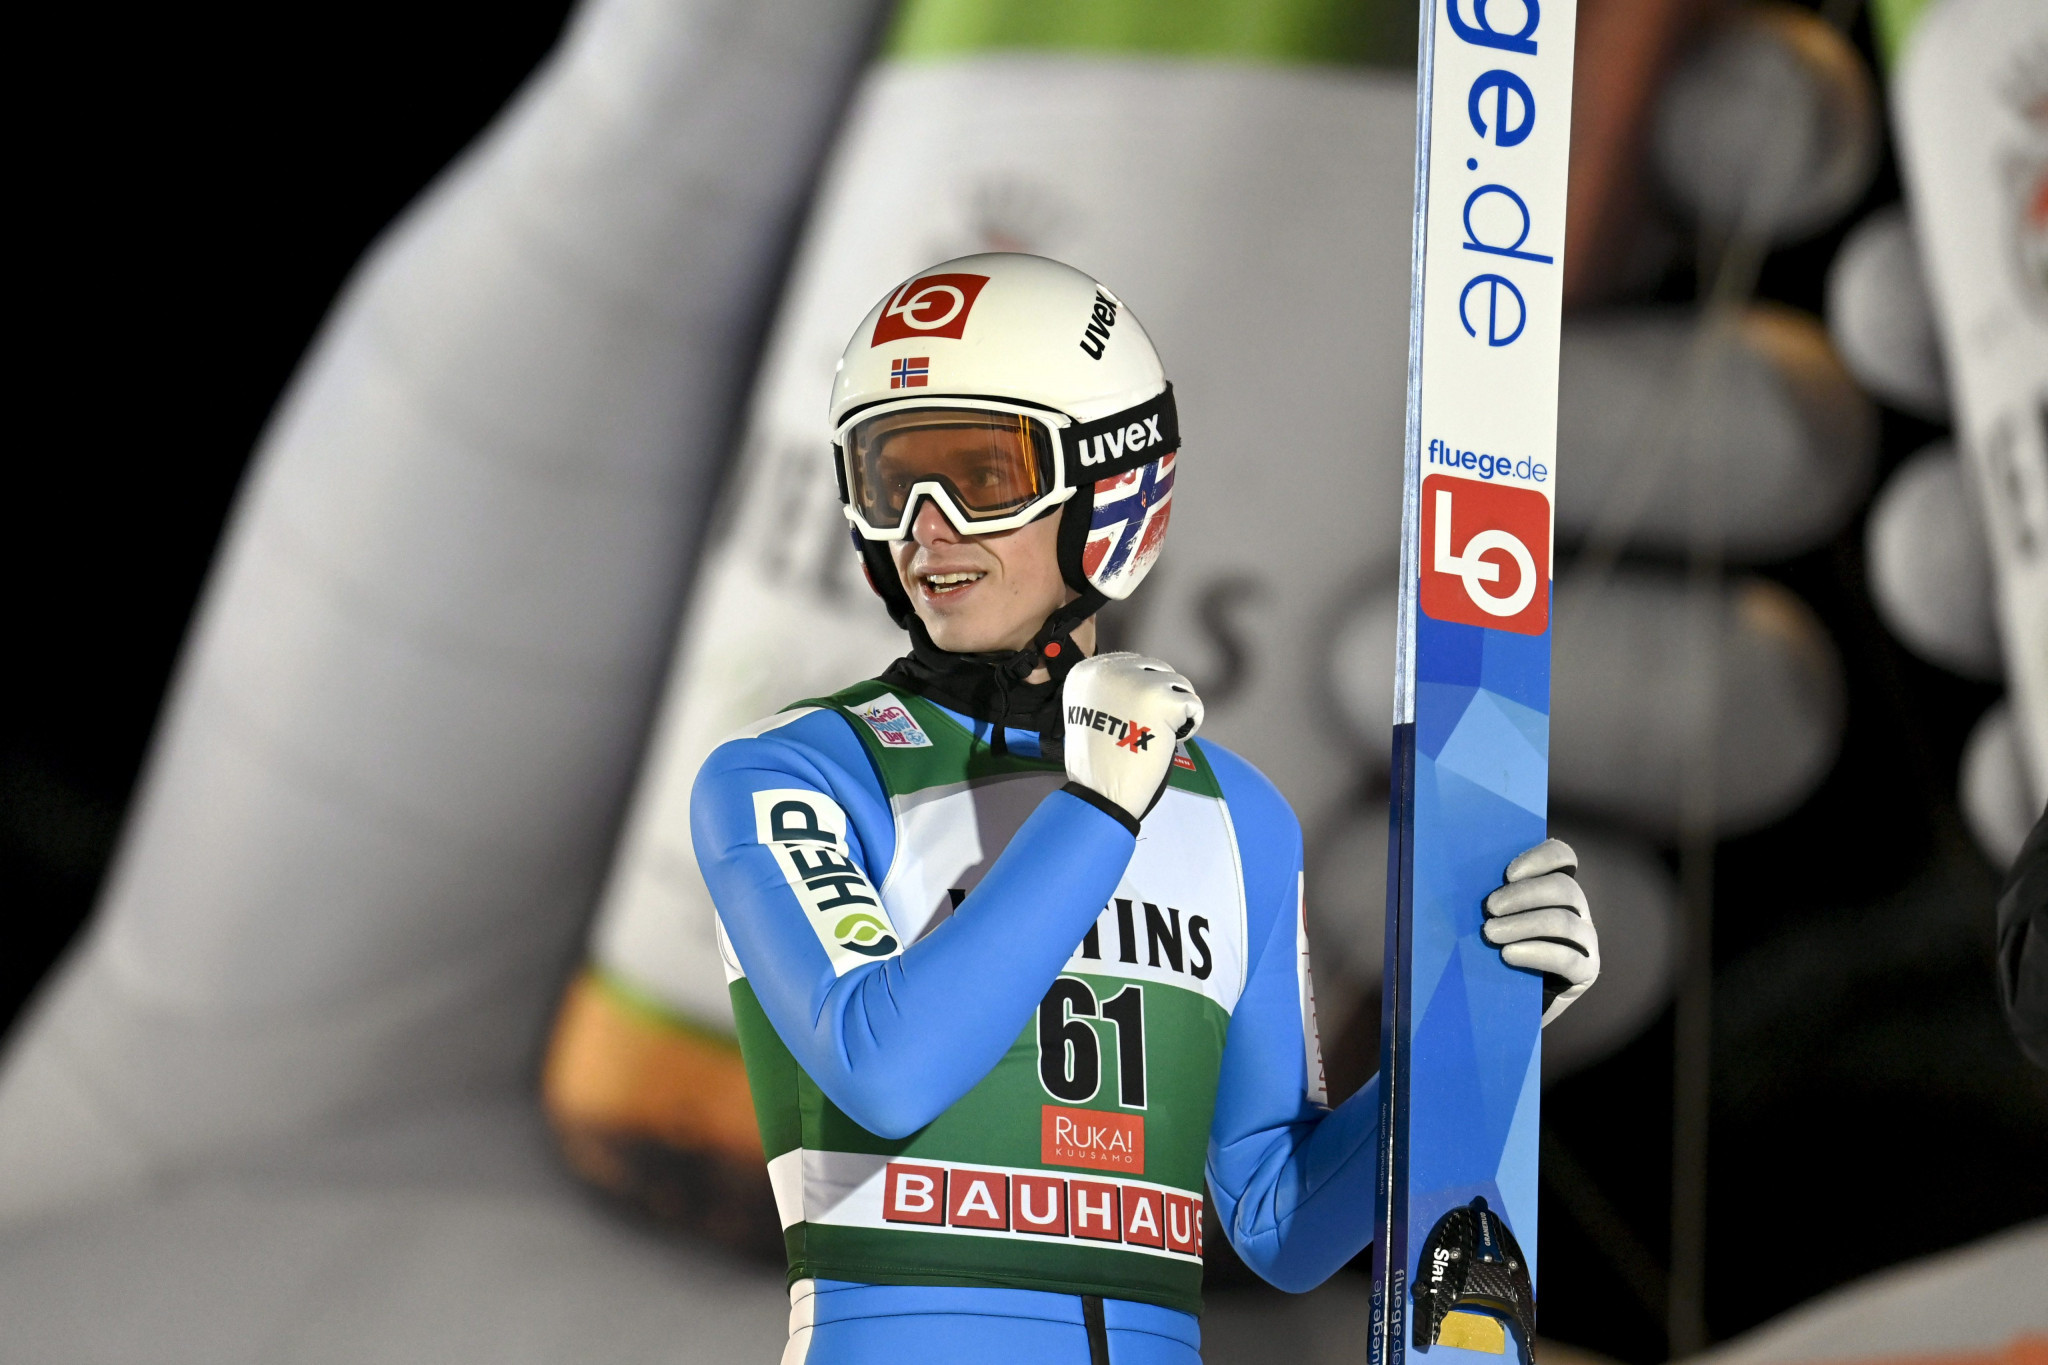 Granerud pips Eisenbichler to gold at FIS Ski Jumping World Cup in Ruka